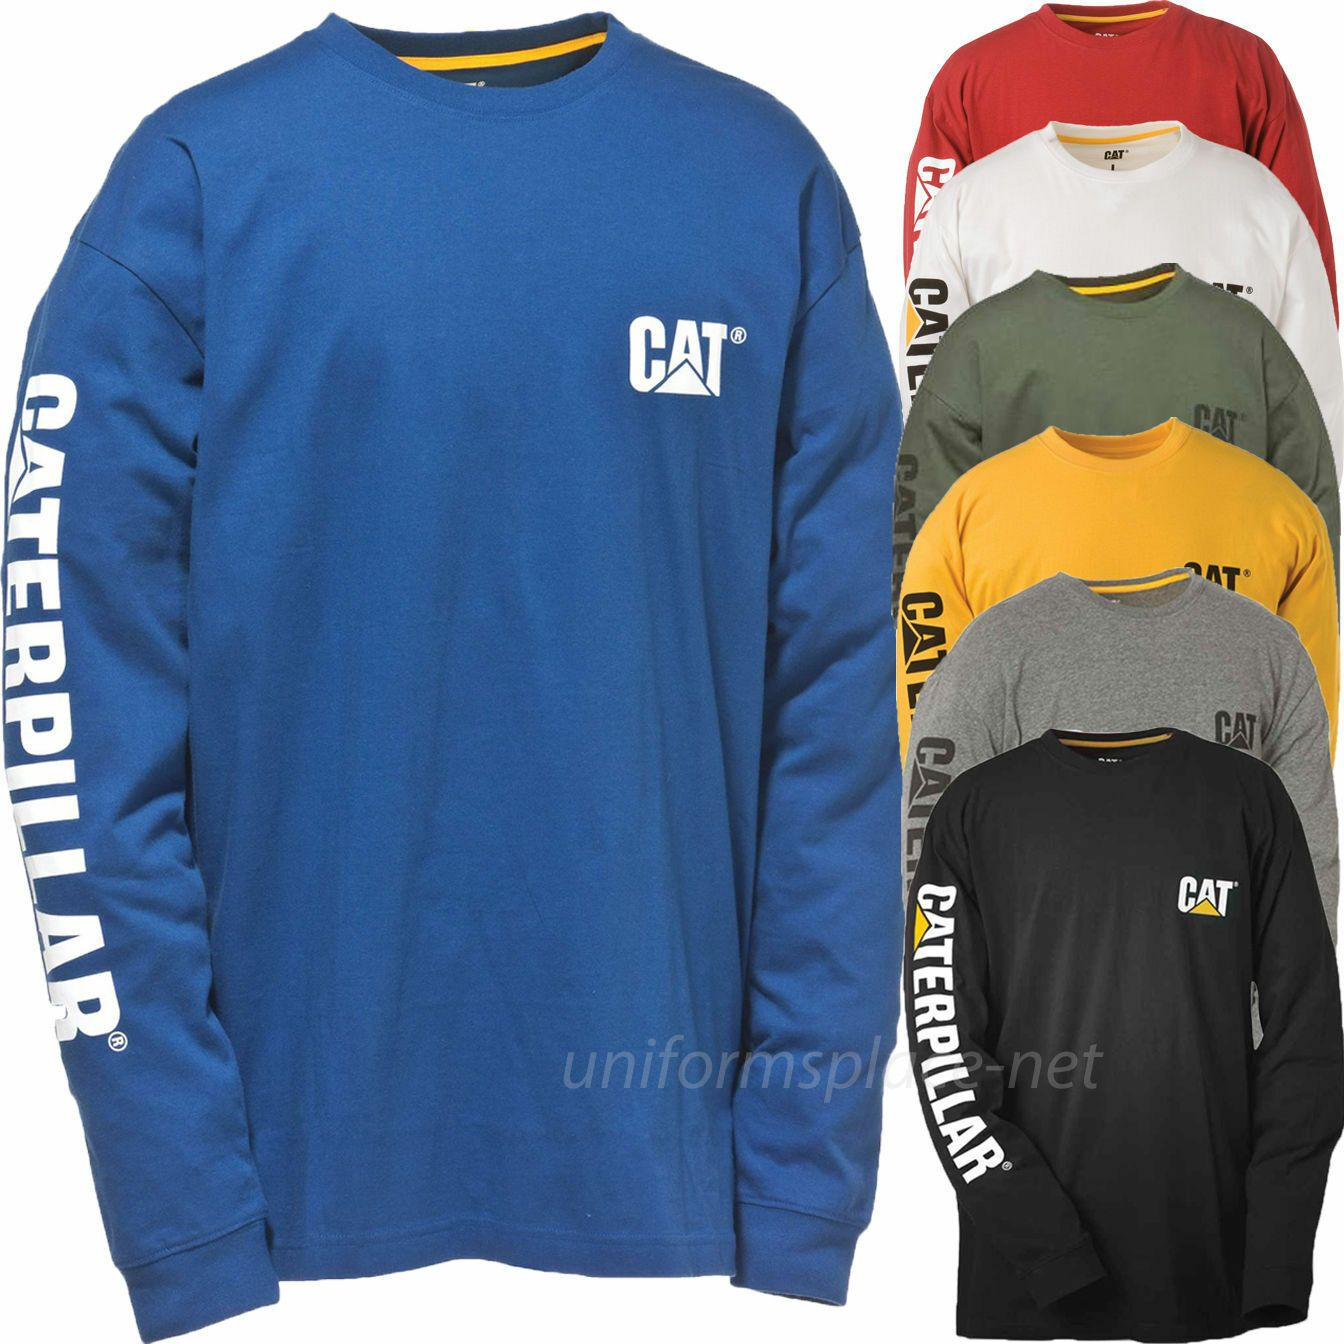 Caterpillar T shirt Men CAT Long Sleeve Graphic Logo Tee T Shirts Cotton Color